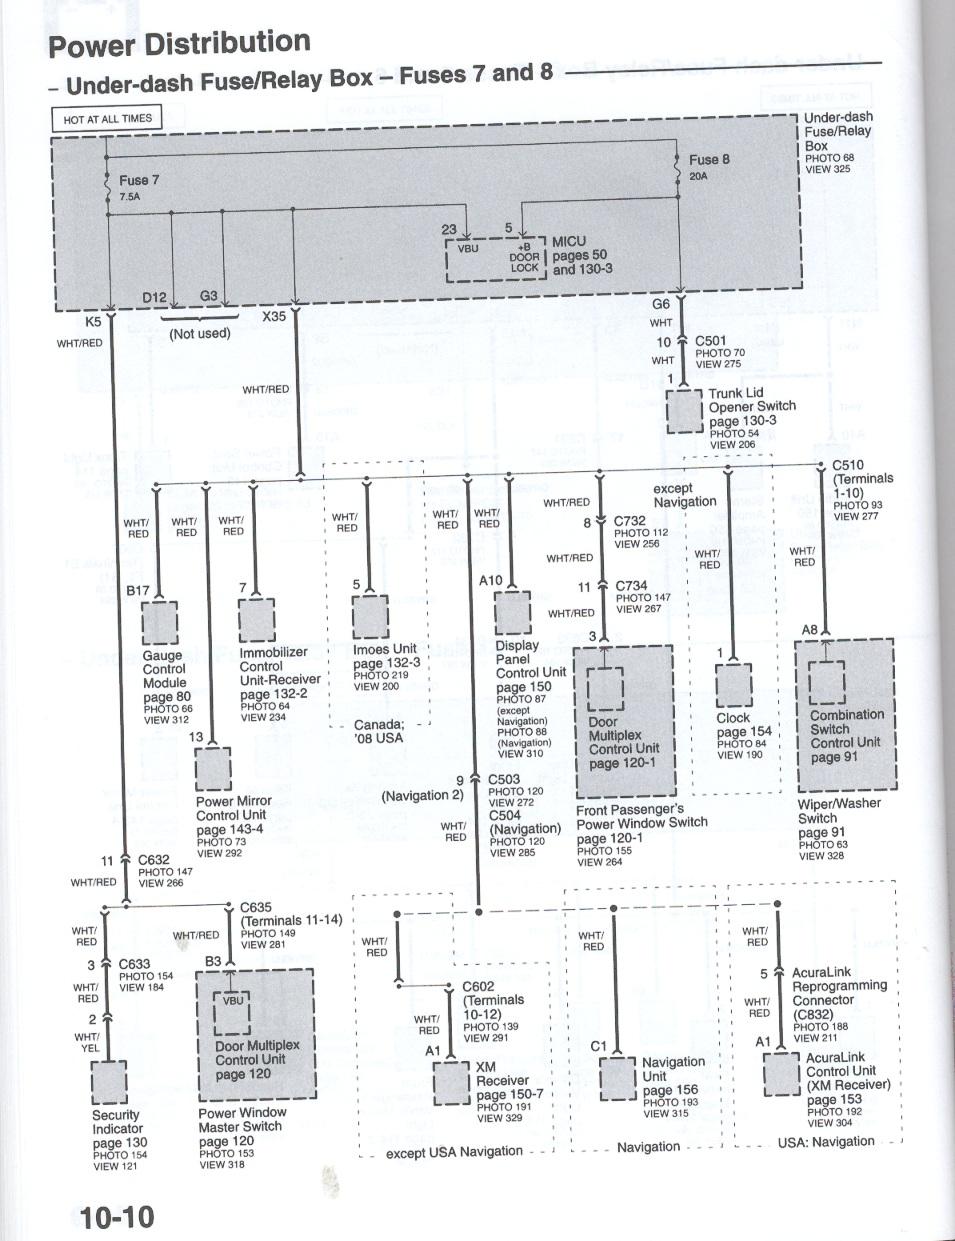 medium resolution of 1997 acura slx fuse box location wiring library 2004 acura mdx fuse box location 1997 acura slx fuse box location